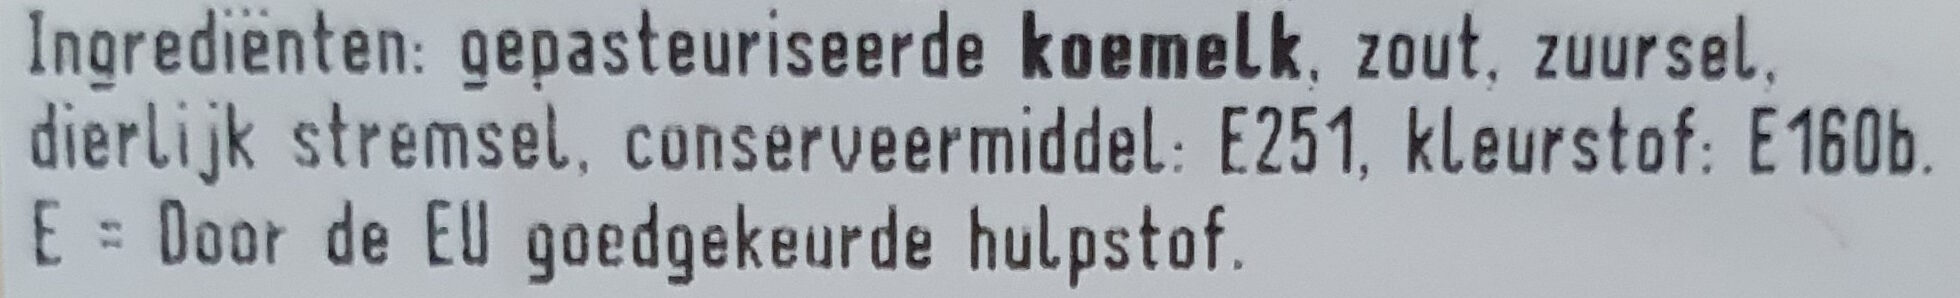 Jong Belegen Gouda kaas 48+ - Ingrediënten - nl